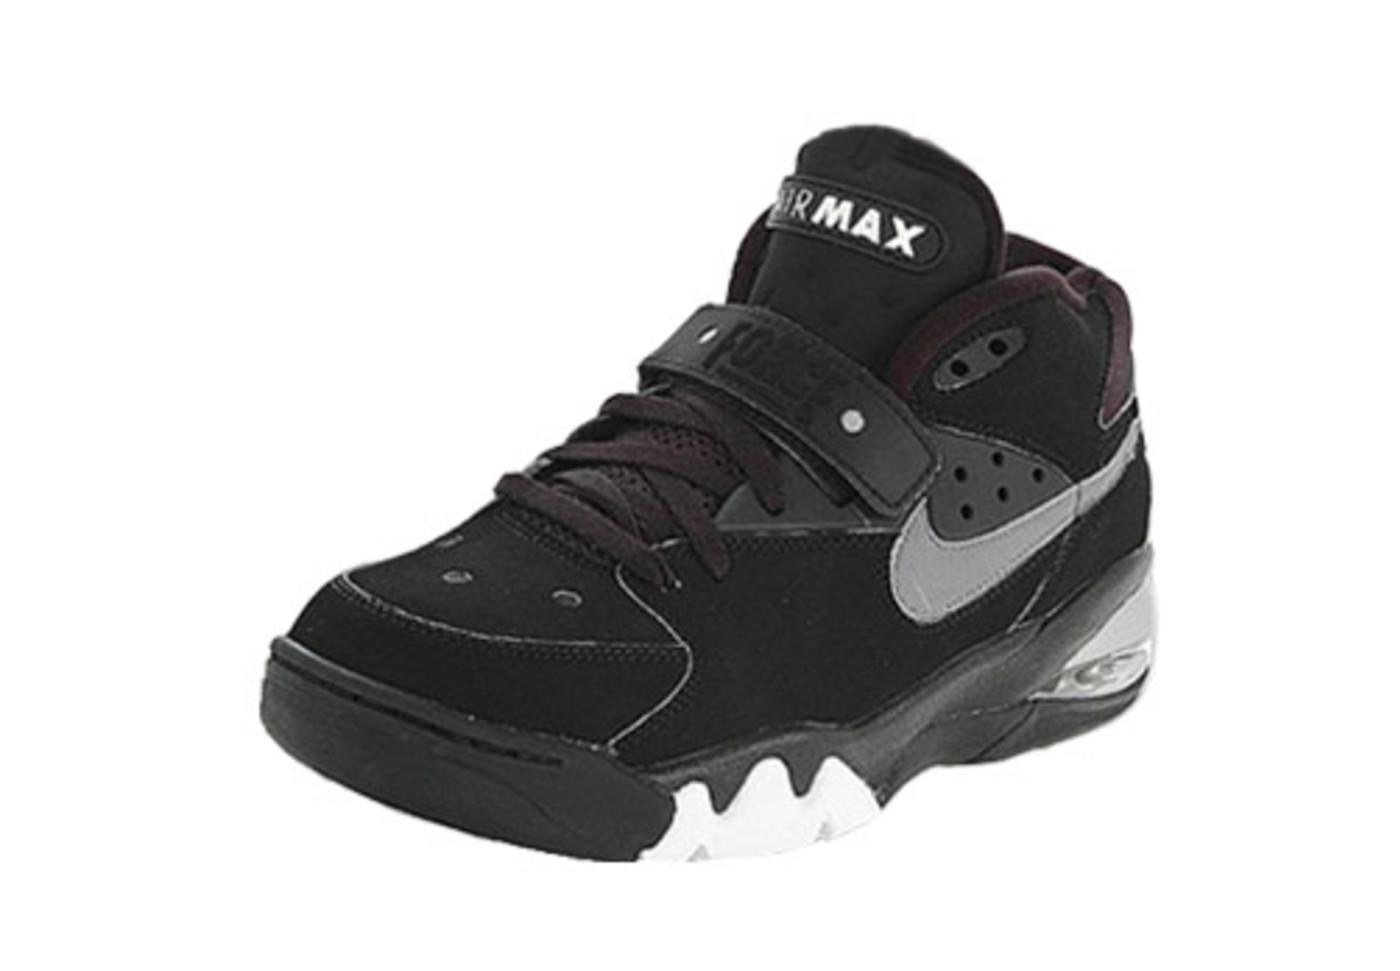 bo jackson shoes 1992